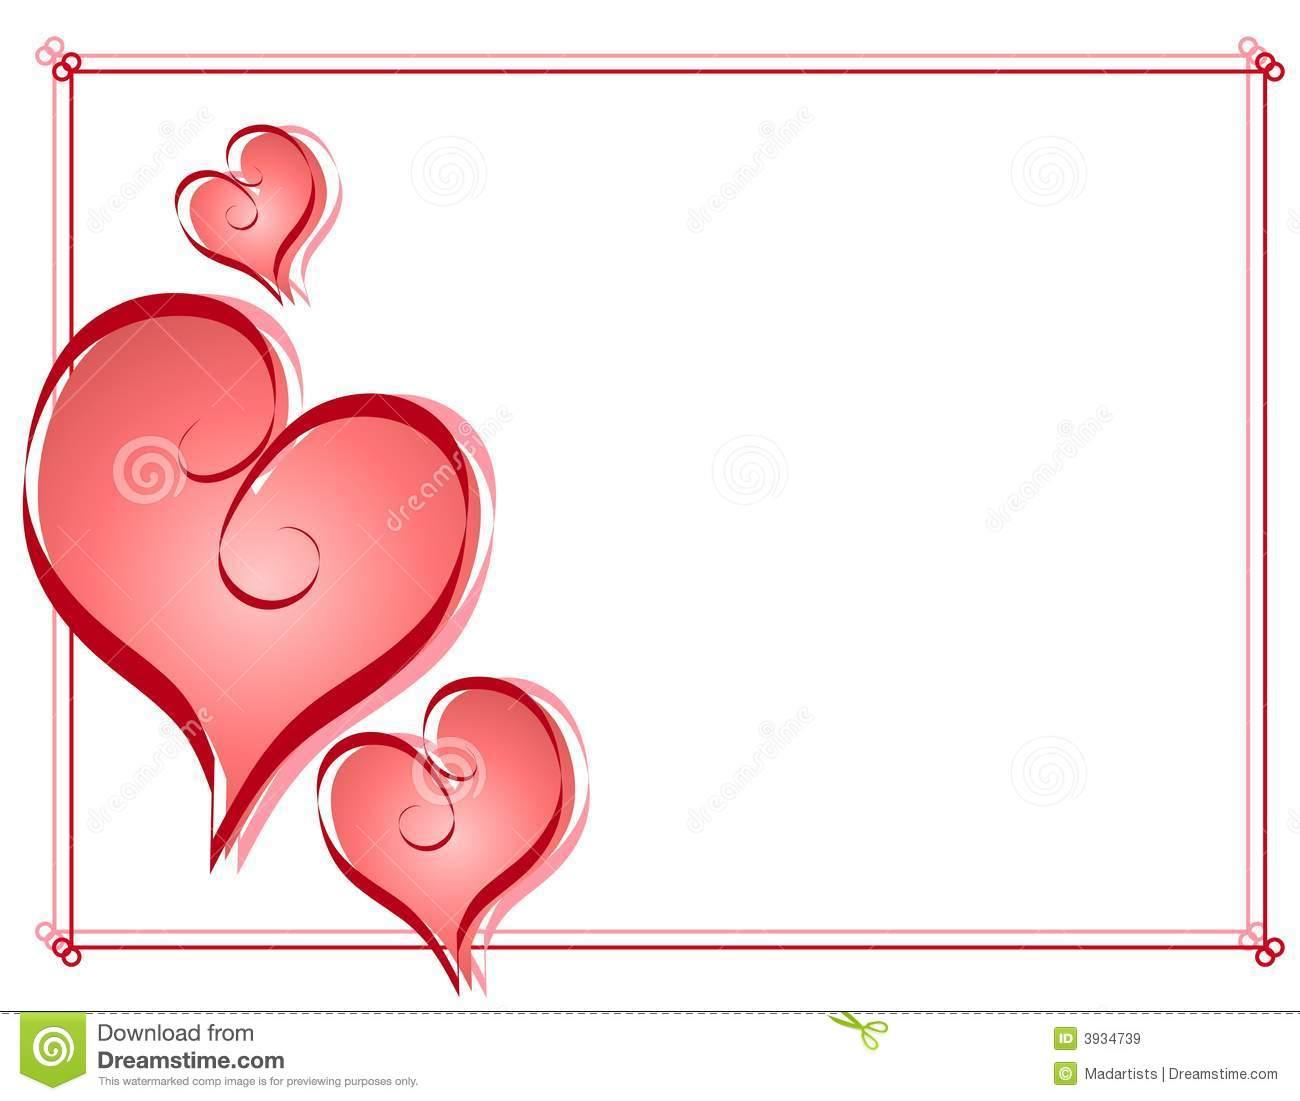 Calligraphy Valentine Hearts .-Calligraphy Valentine Hearts .-5